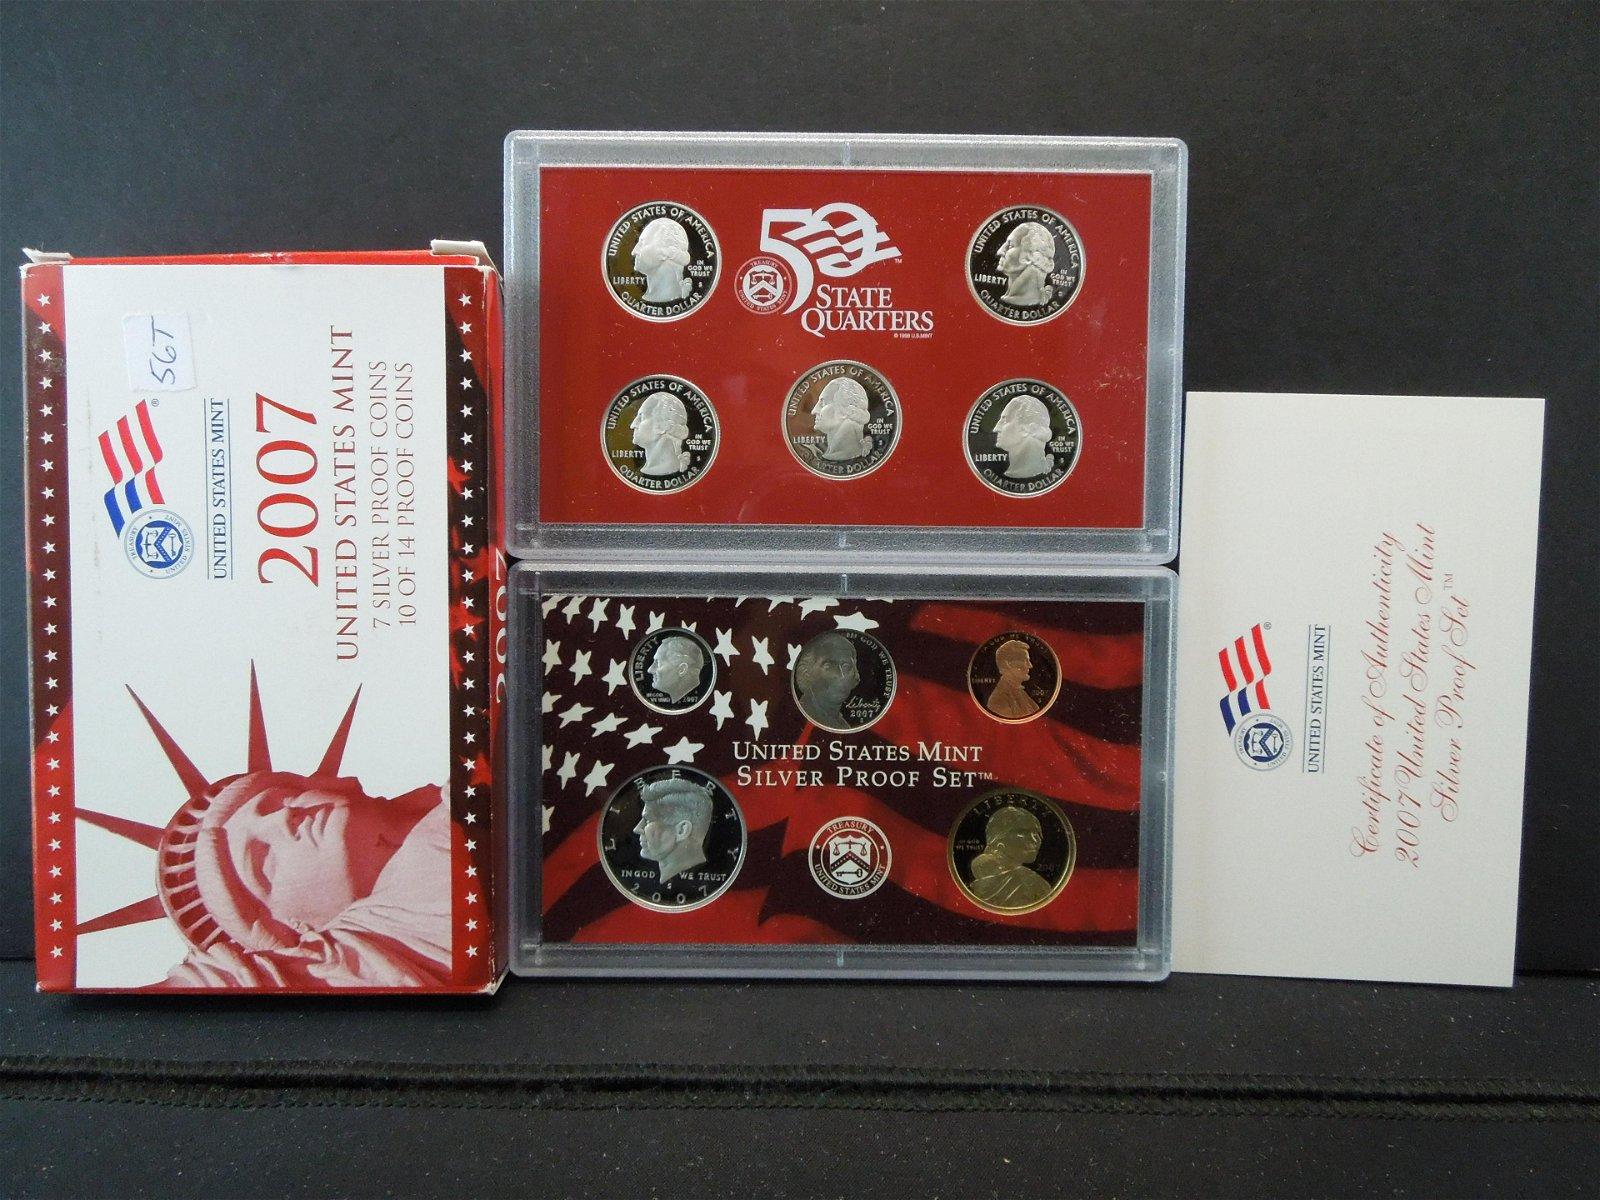 2007 U.S. Mint Silver Proof Set